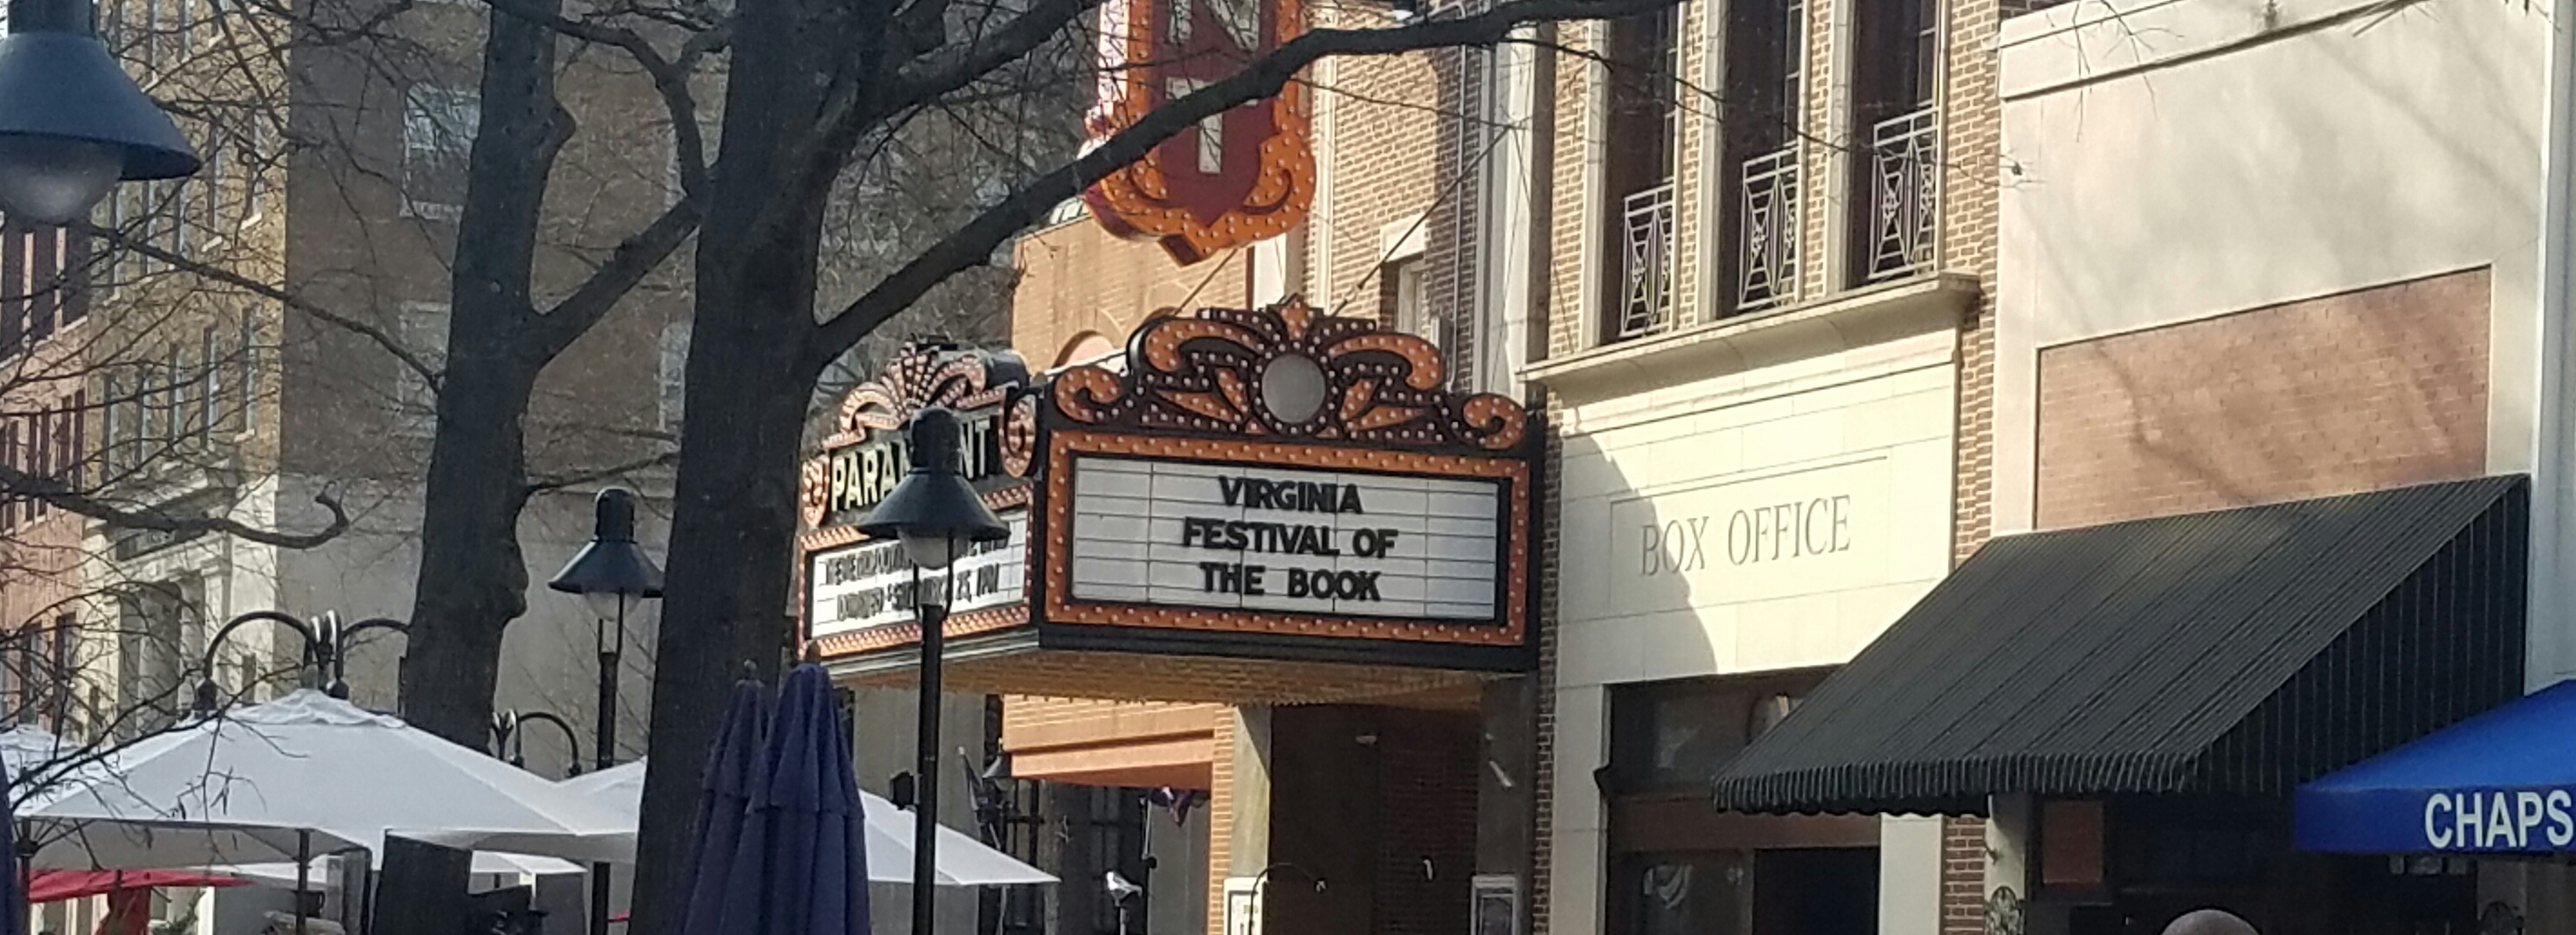 Book festival 2014 charlottesville va newspaper